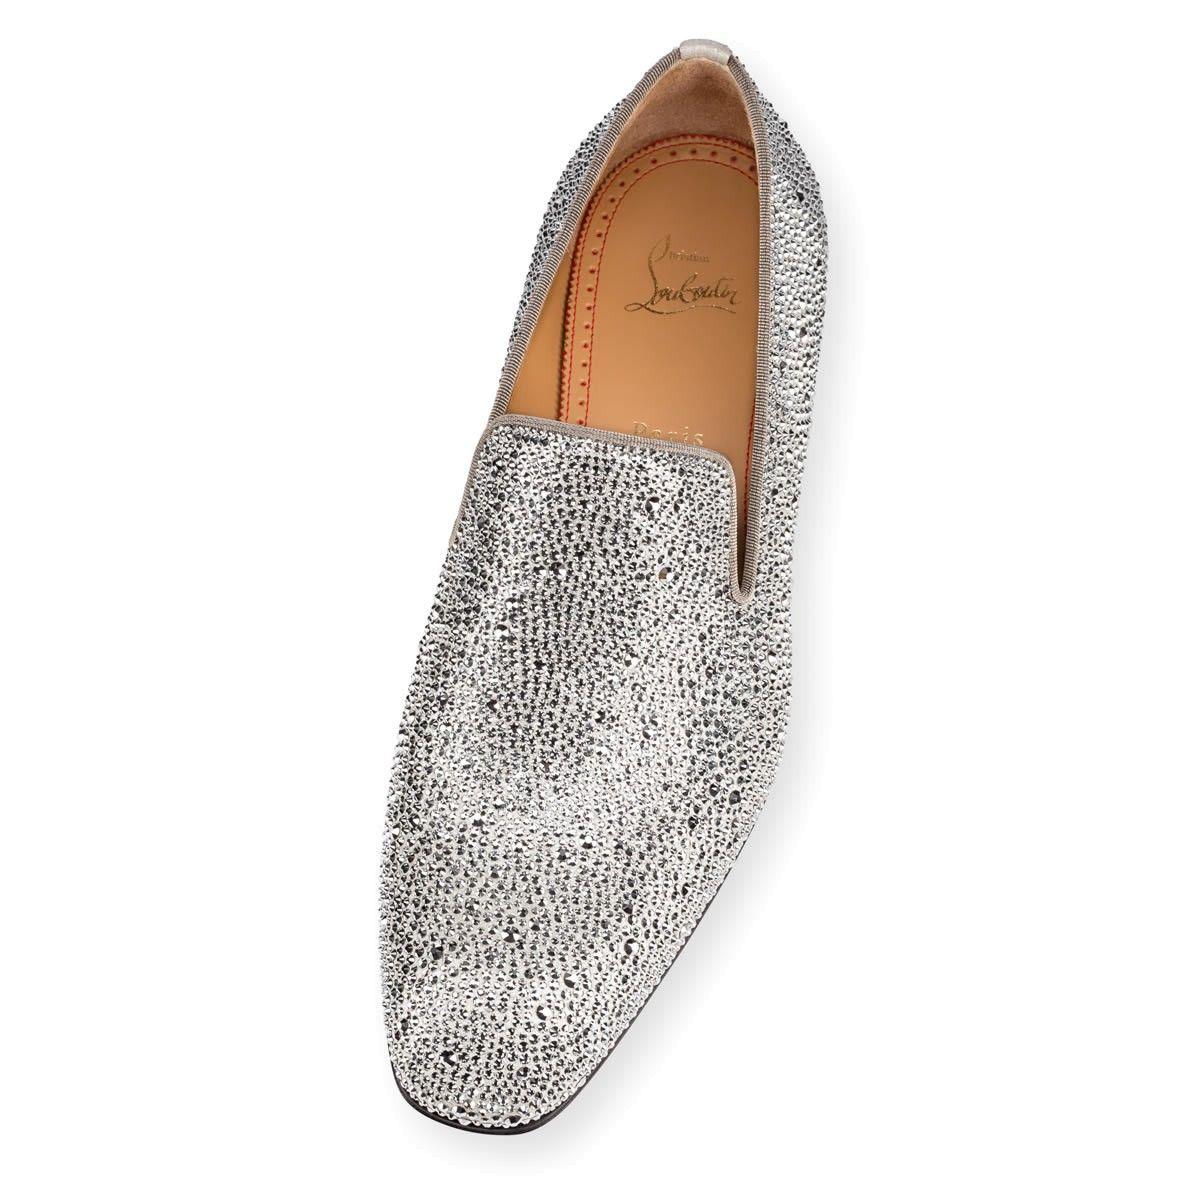 1c1b337d07ce8c Shoes - Dandelion Strass Flat - Christian Louboutin